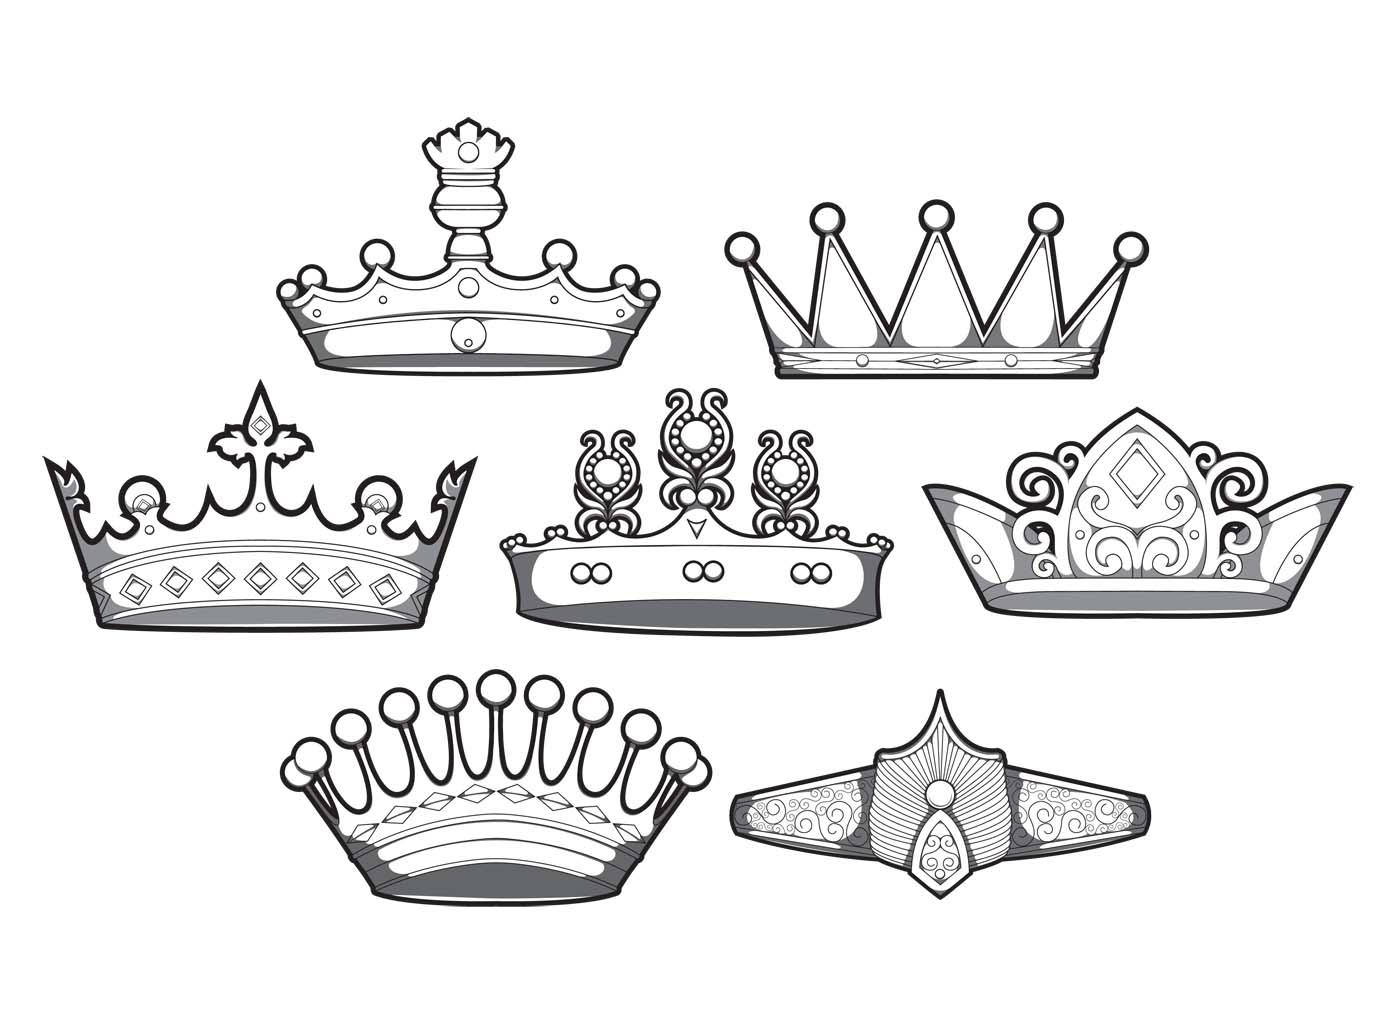 Set of 7 designious crowns